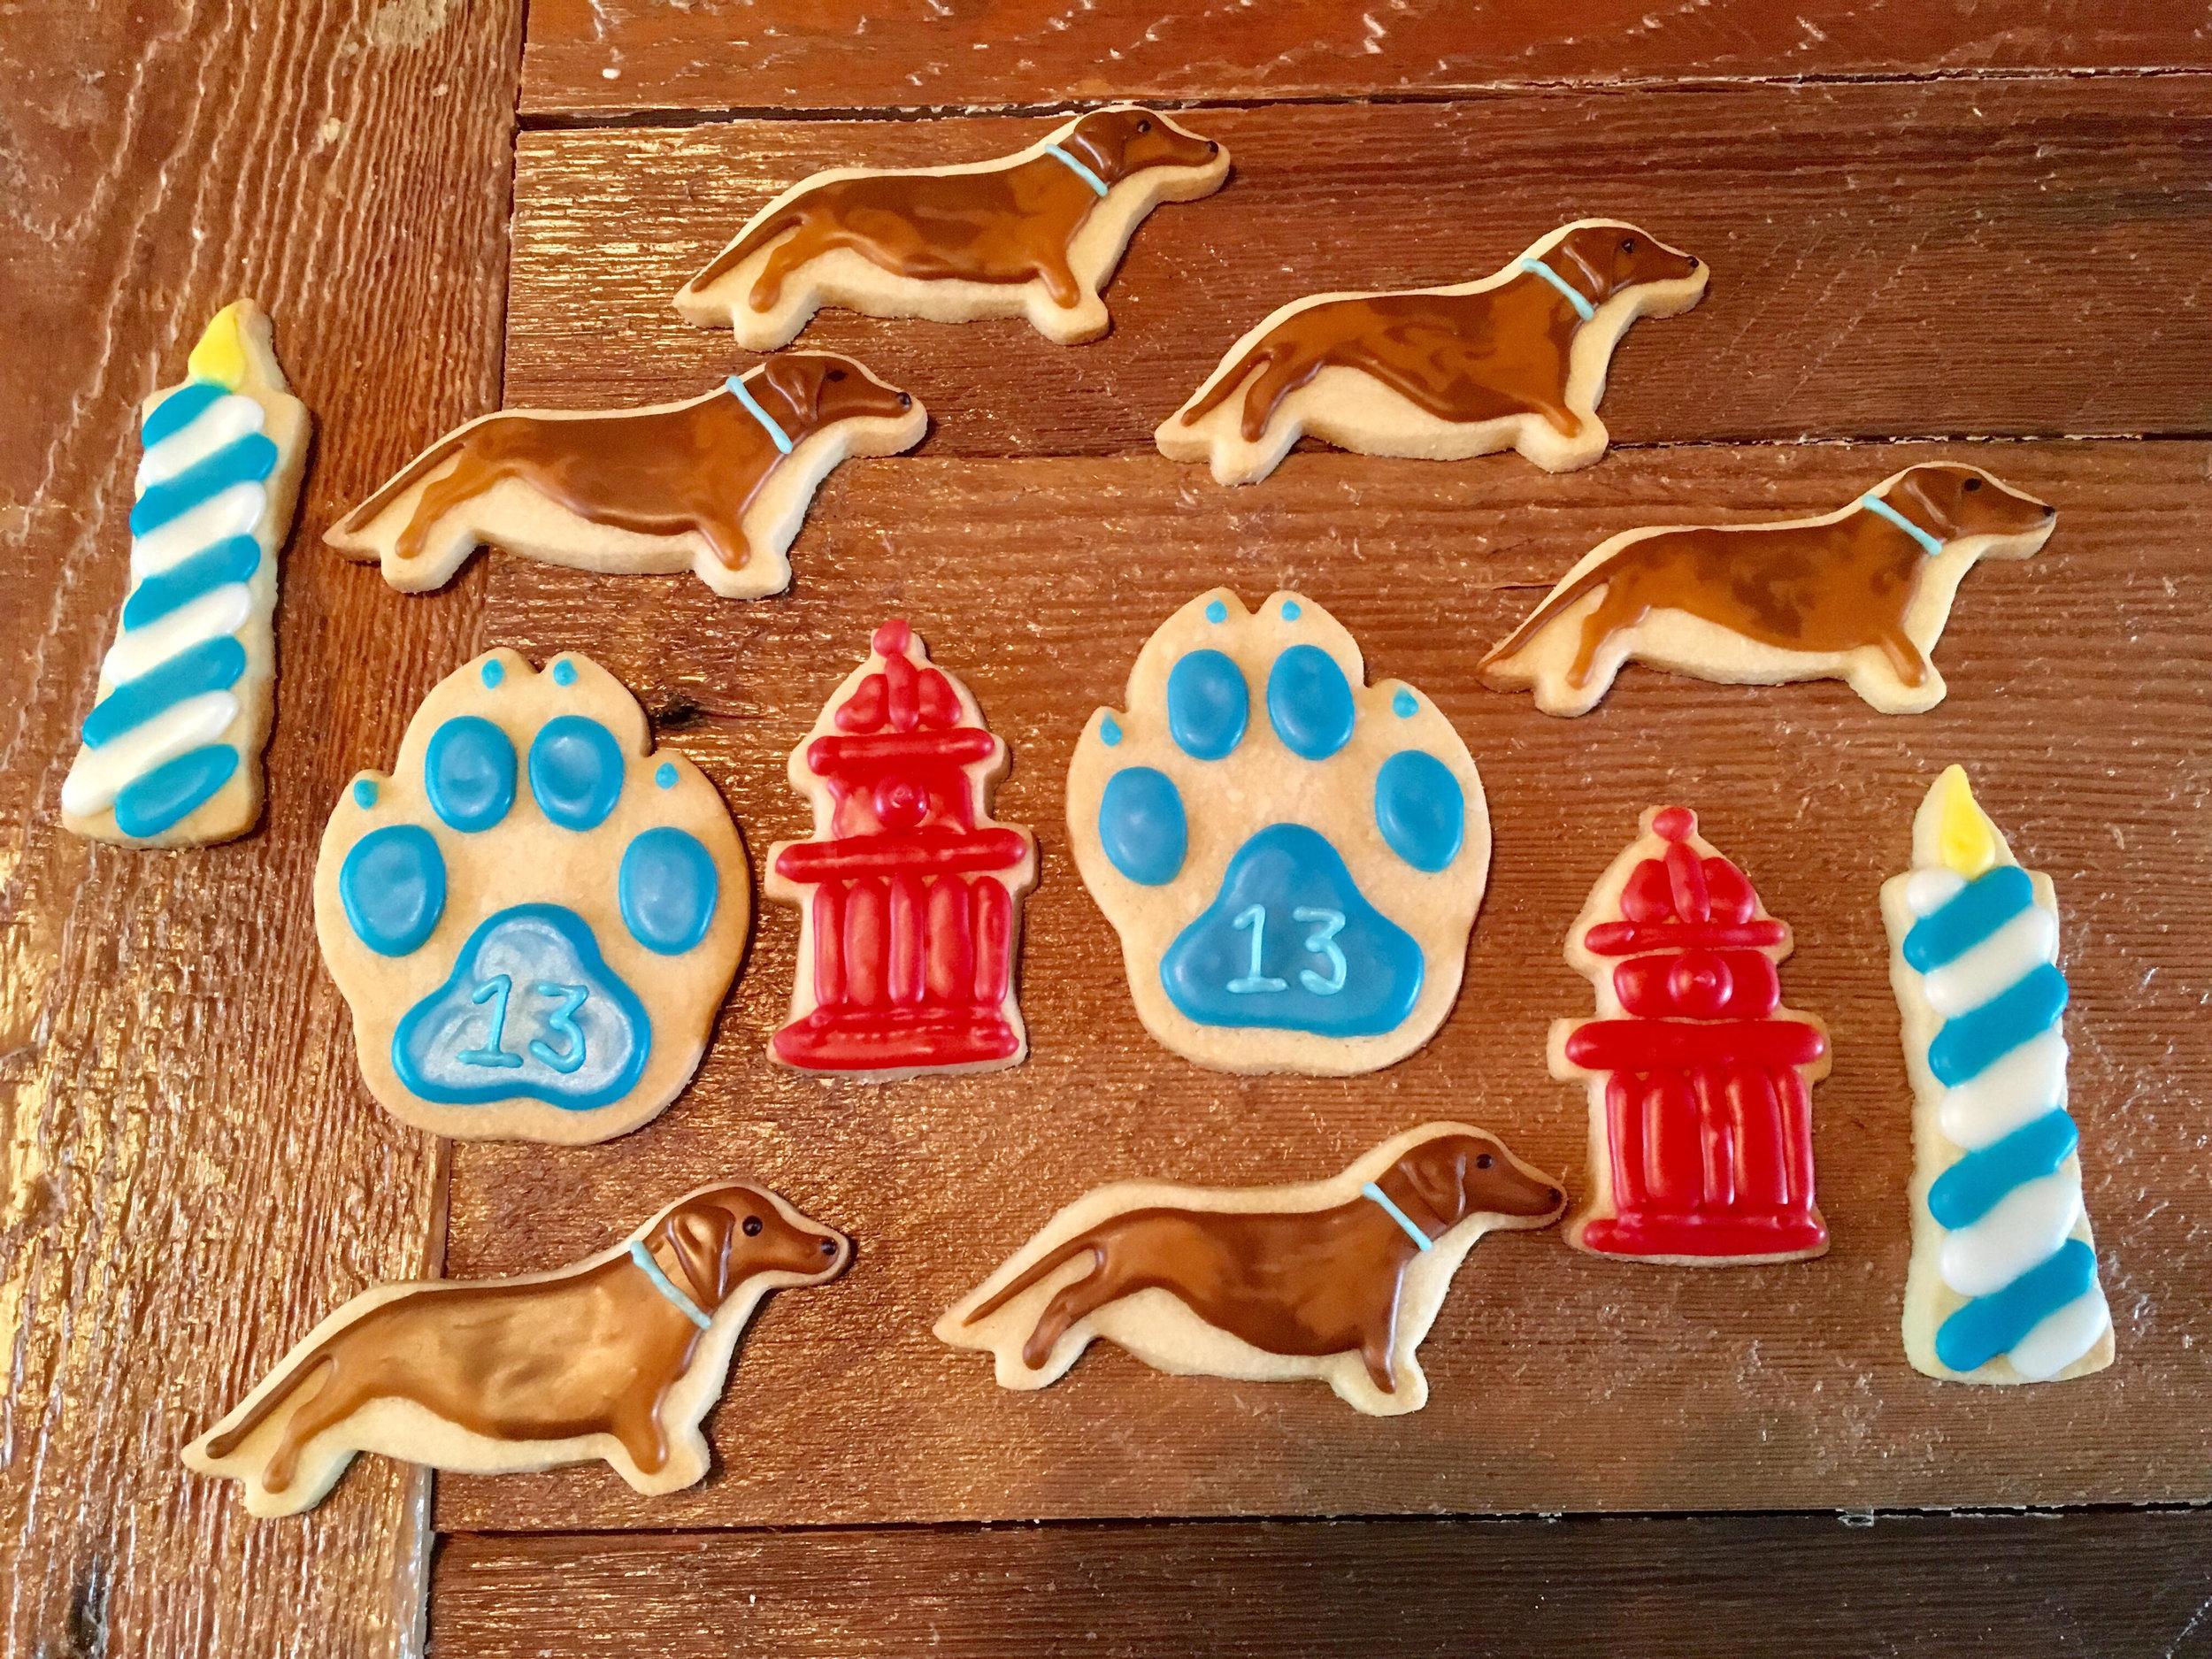 dachshund cookies.jpg